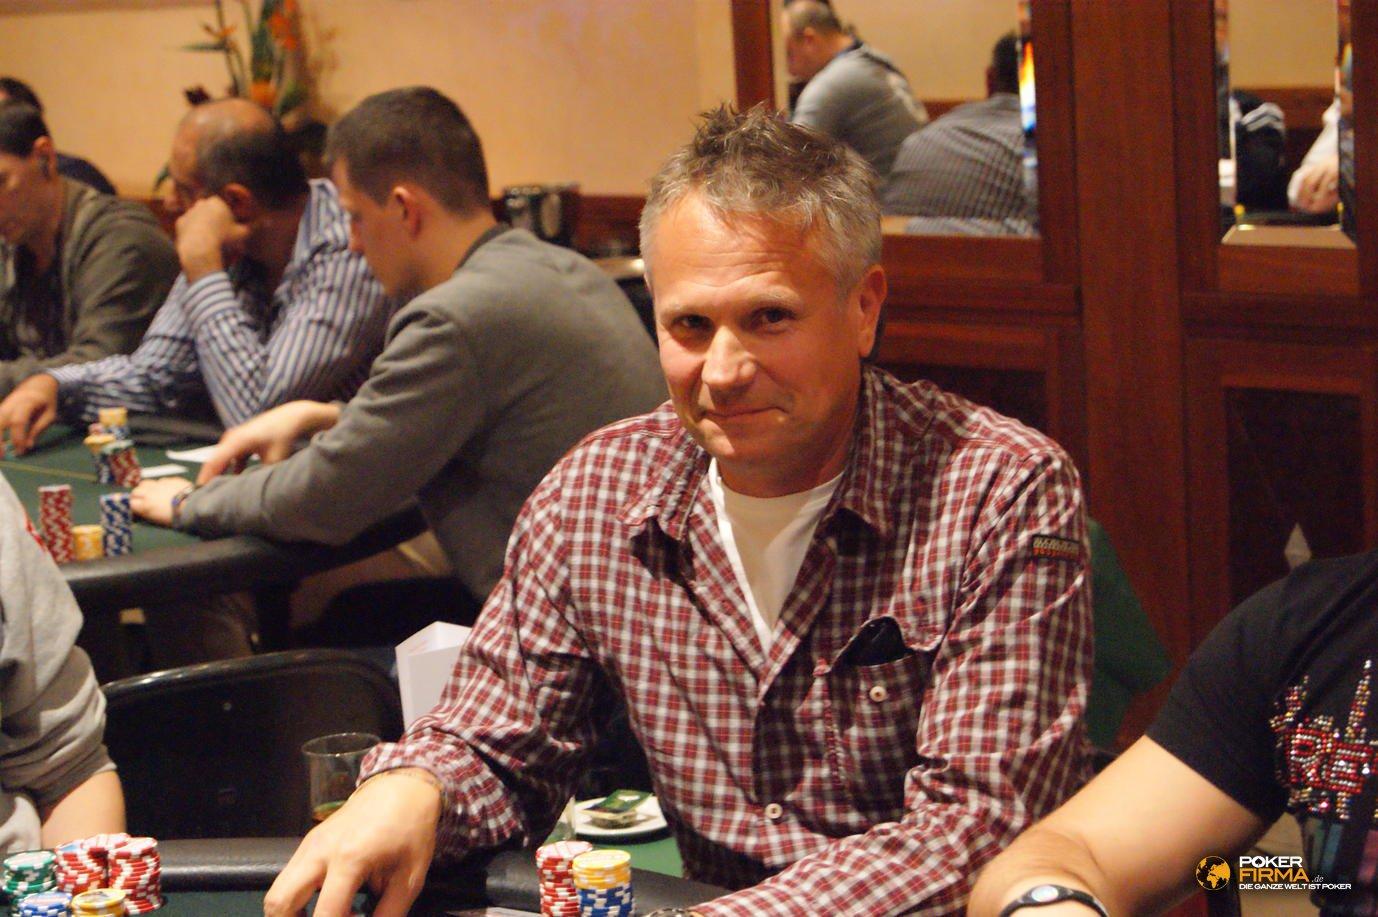 Poker_EM_2000_NLH_251011_Thomas_Dolezal